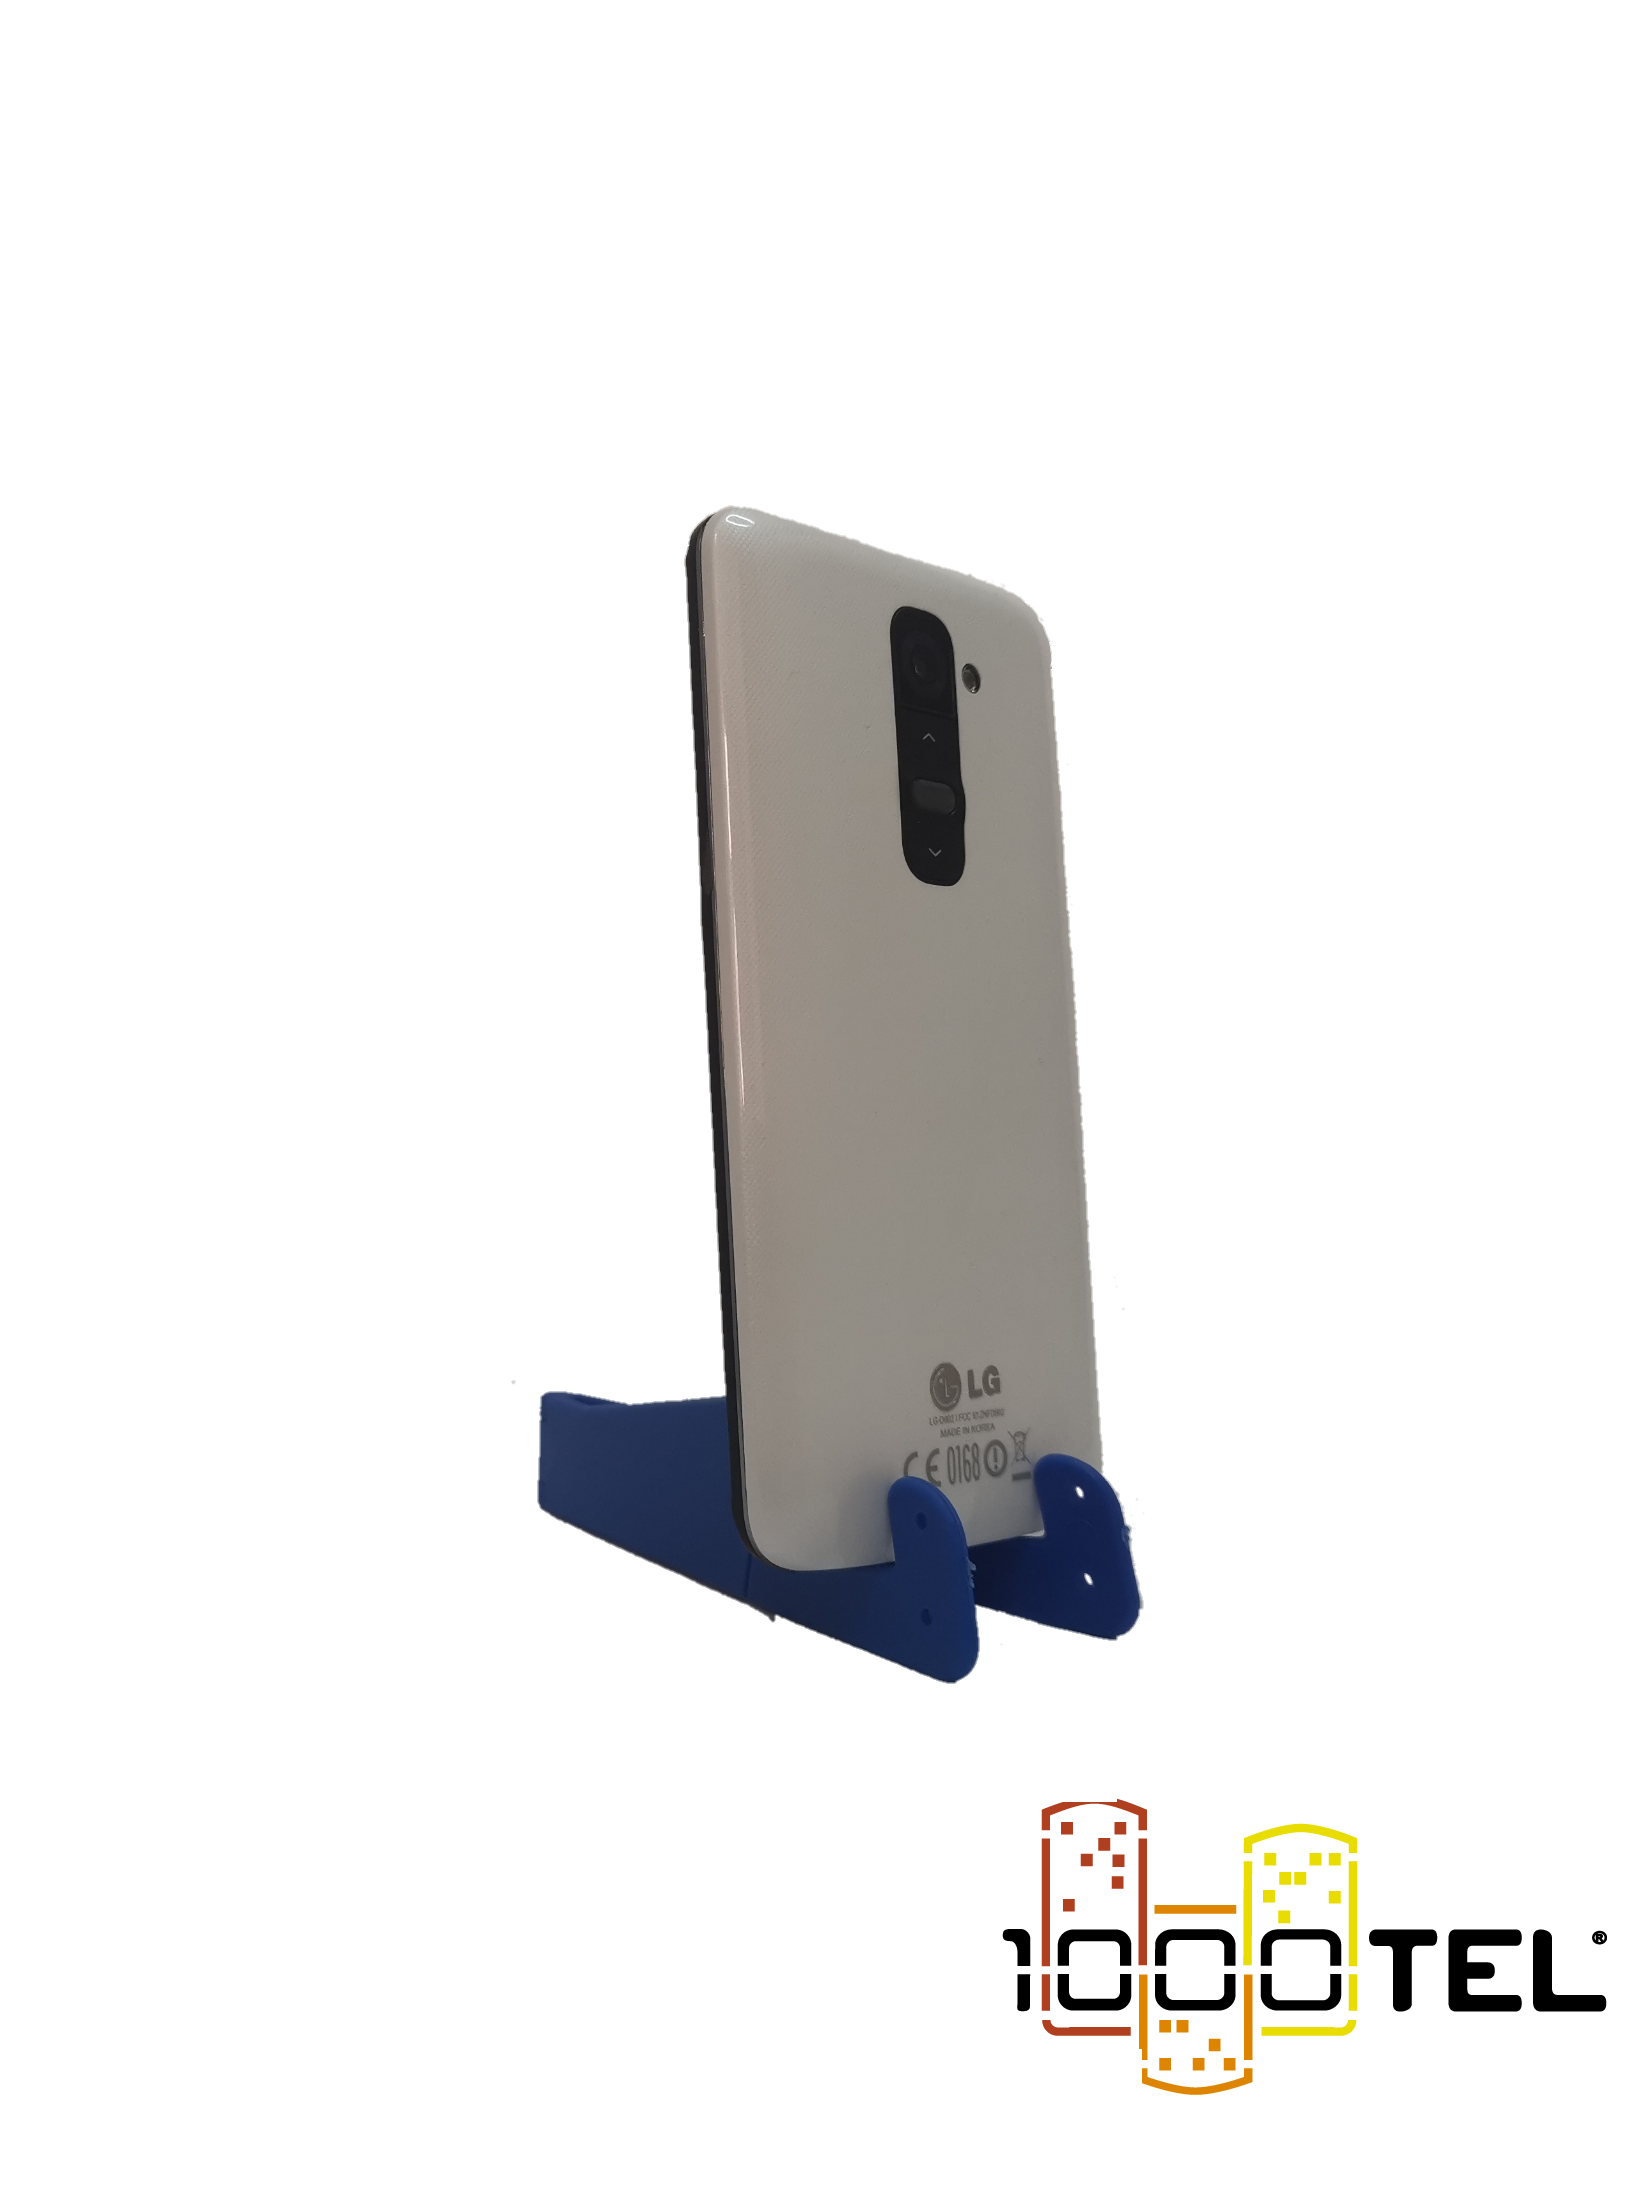 LG G2 #3